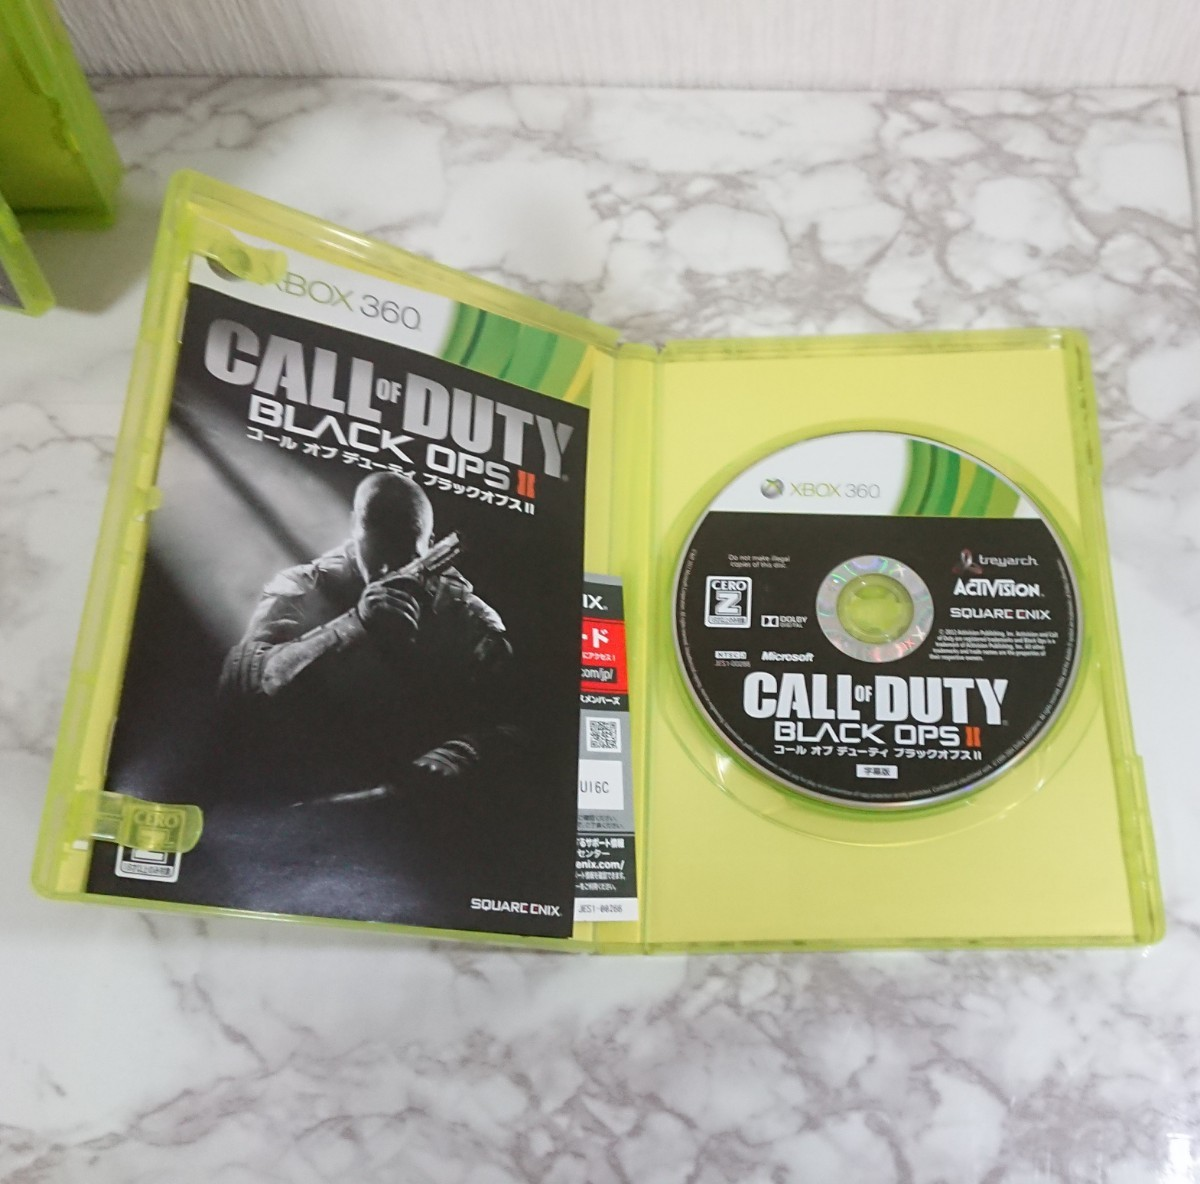 Xbox360 ソフト コールオブデューティ